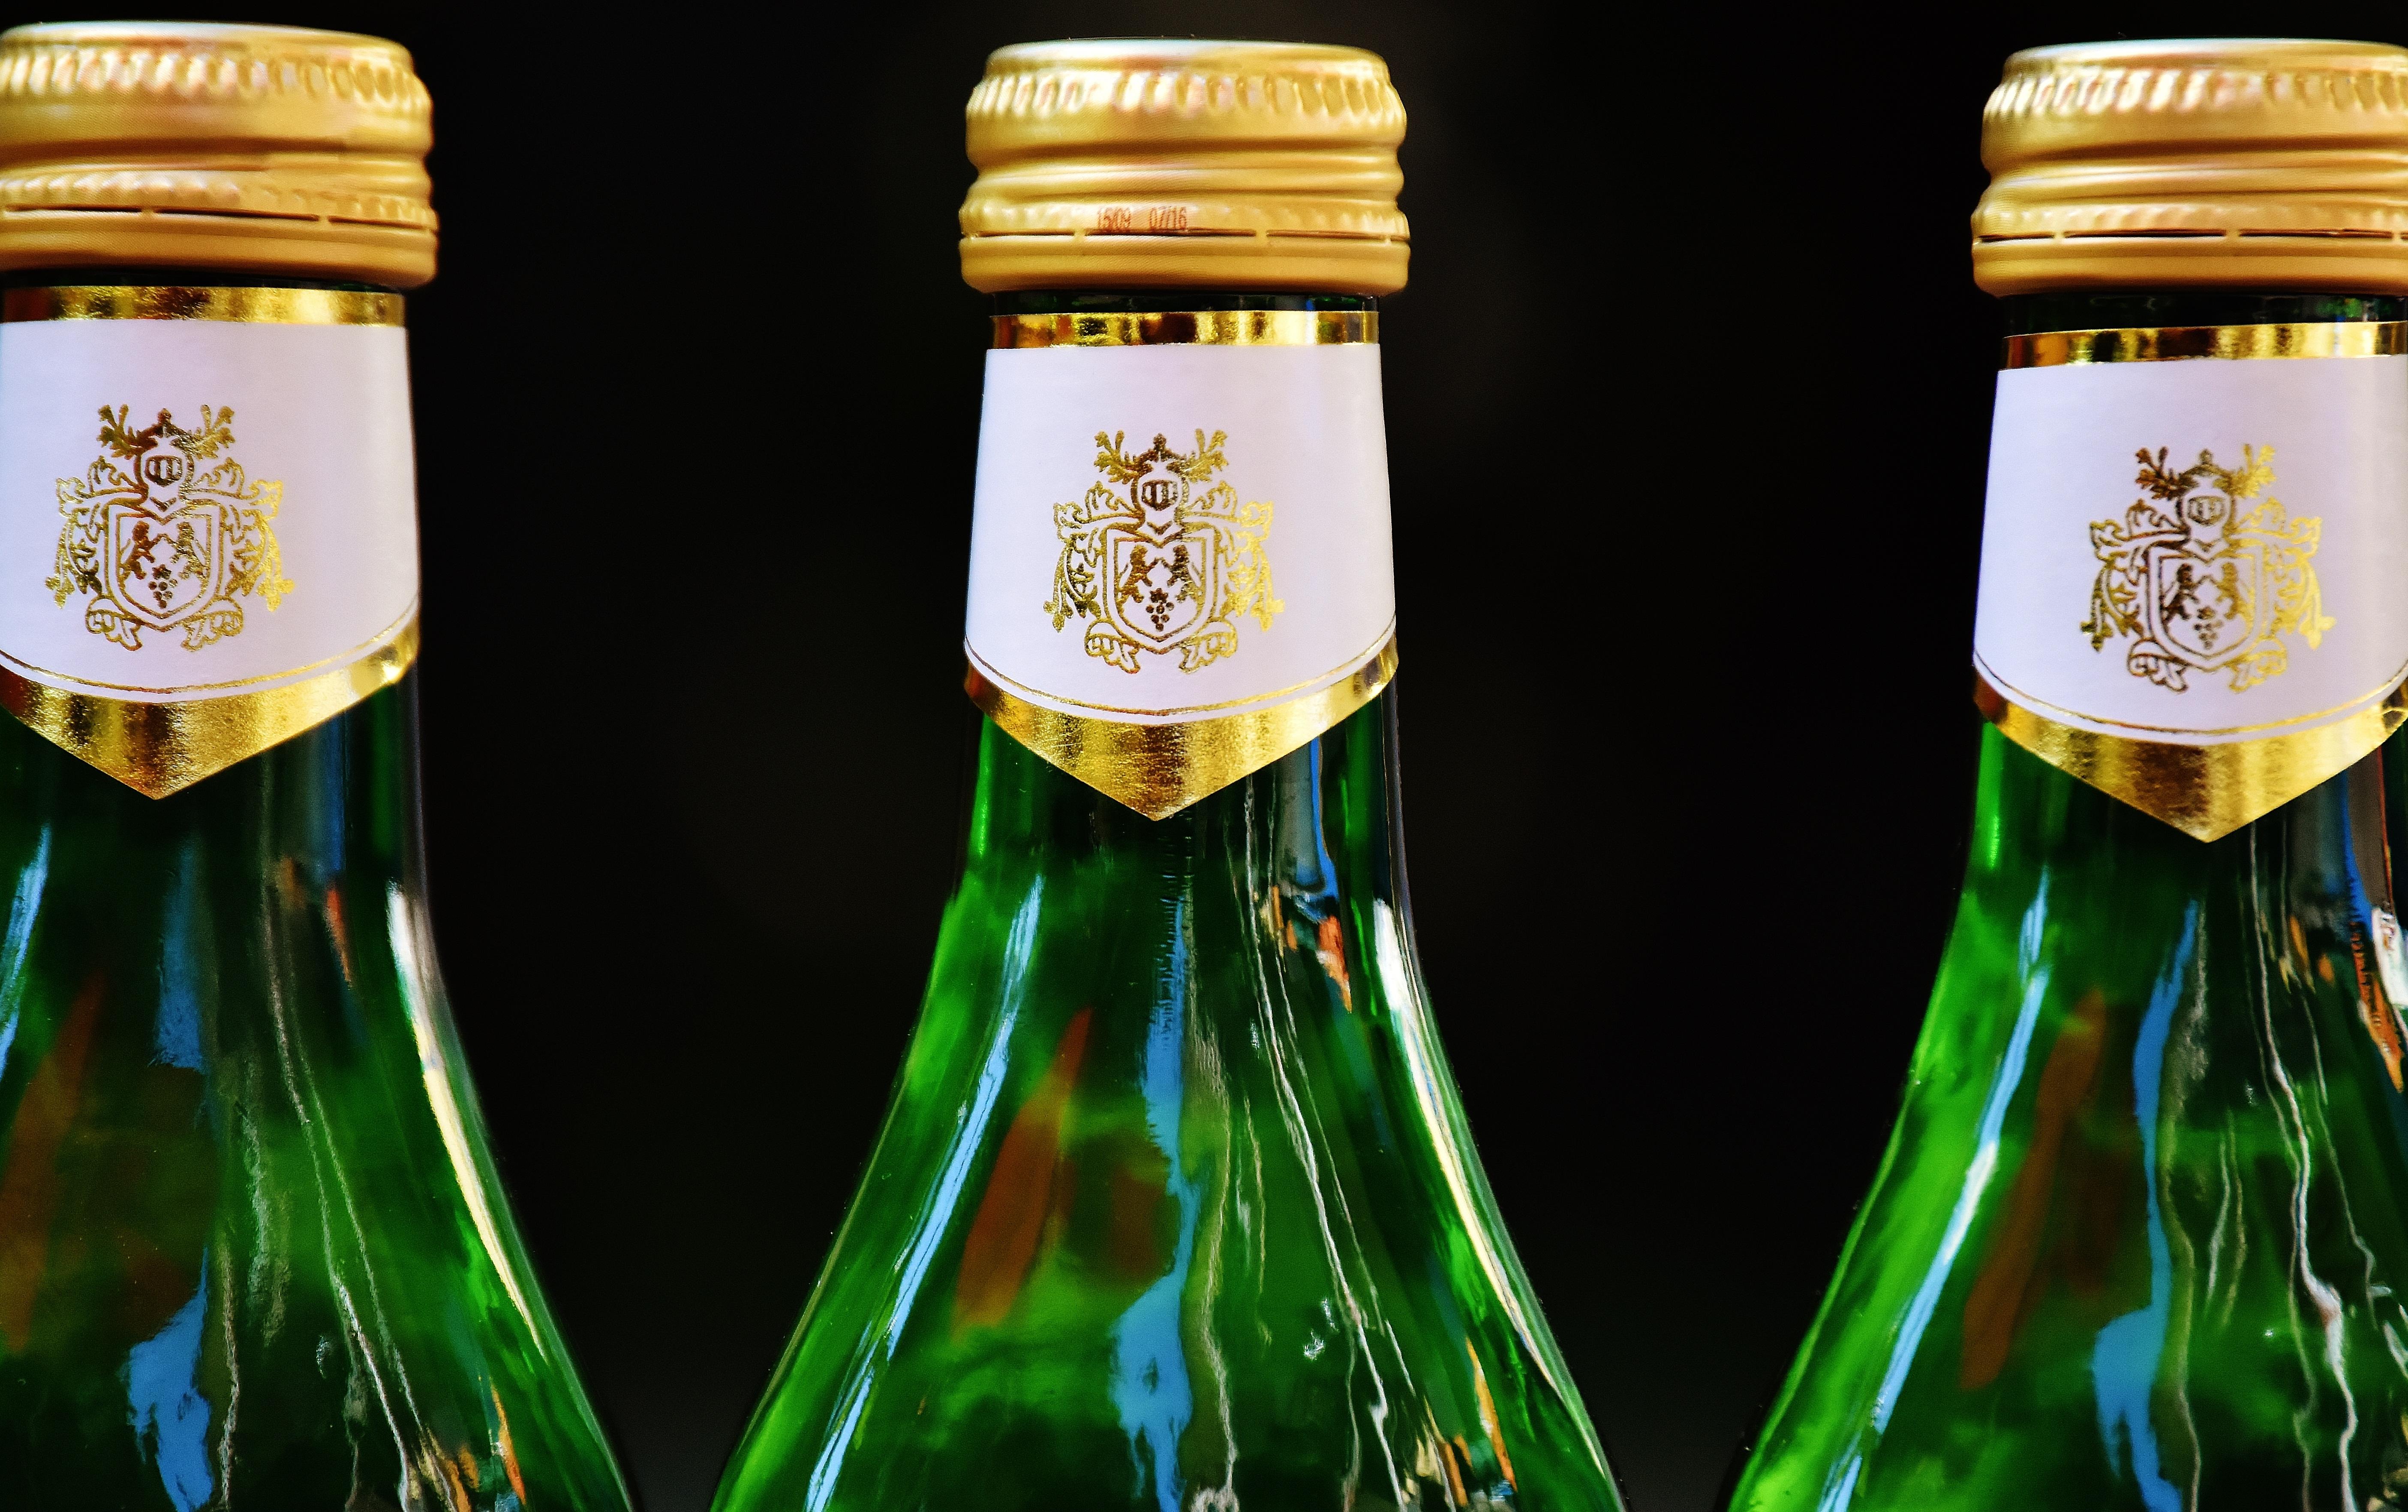 Free Images : restaurant, drink, alcohol, wine bottle, glass bottle ...